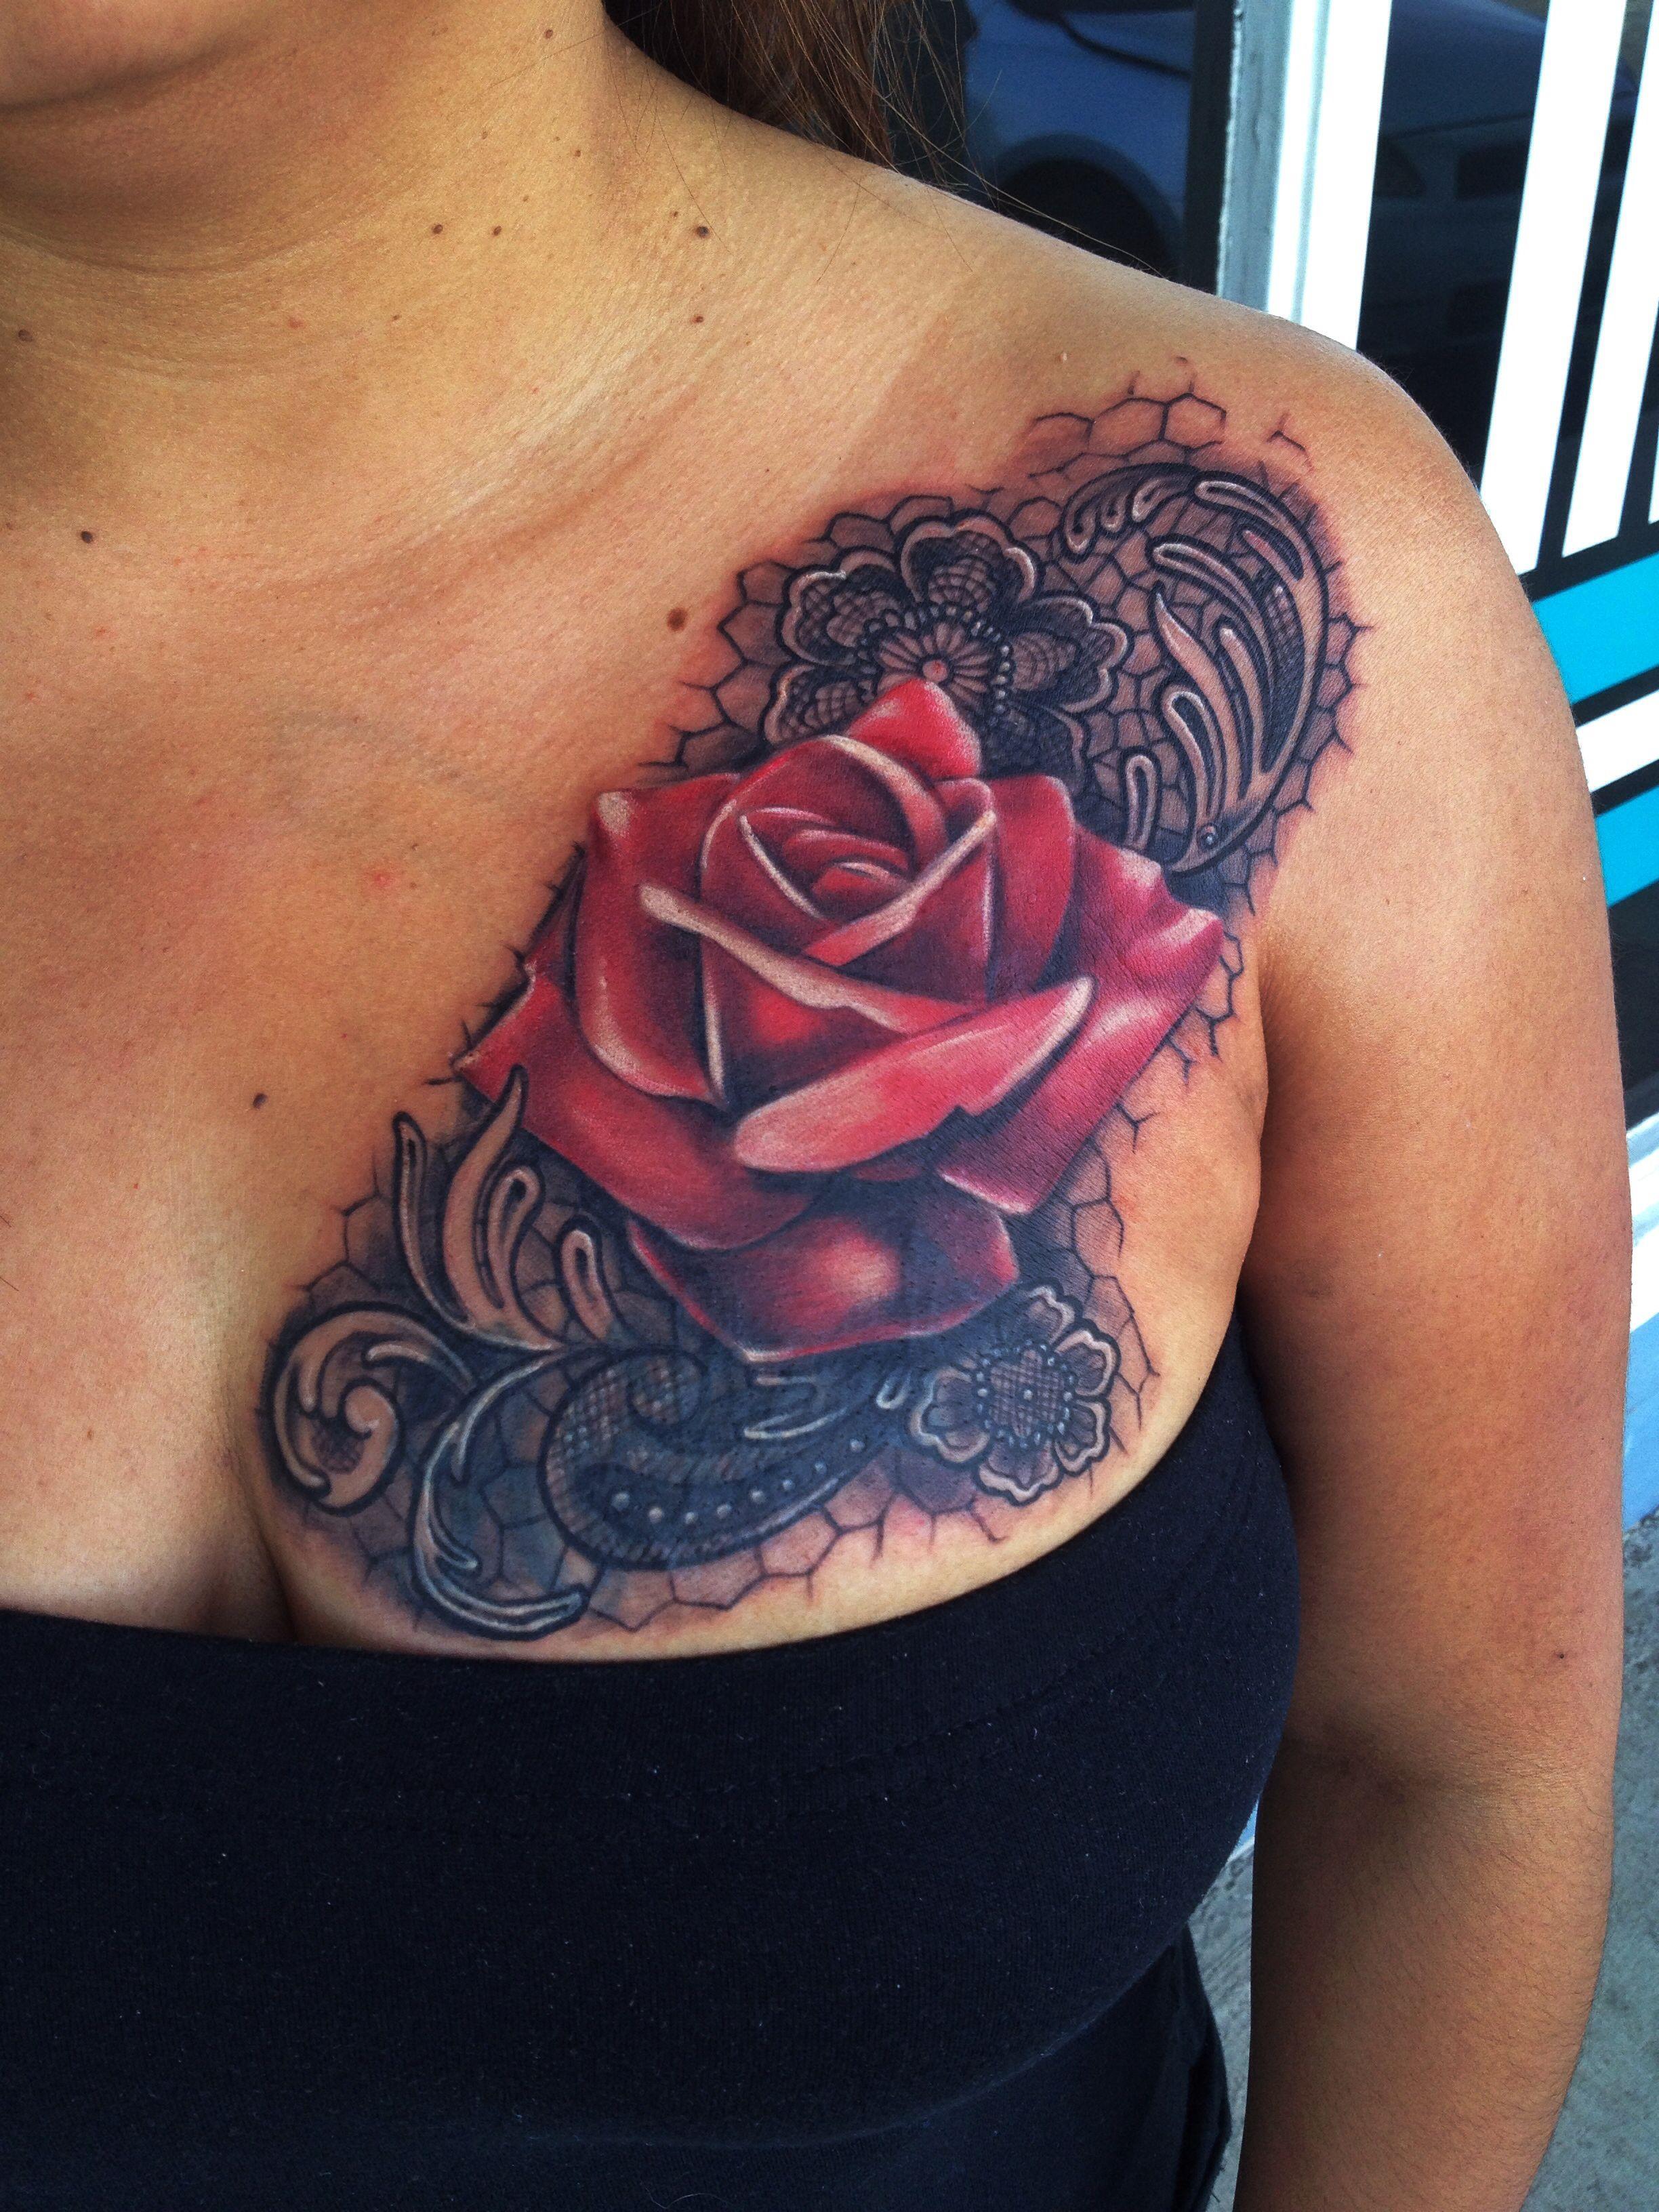 Pin By Evangelink Chrisburnett On Tattoo By Chris Burnett Ink Tattoo Tattoos Lace Tattoo